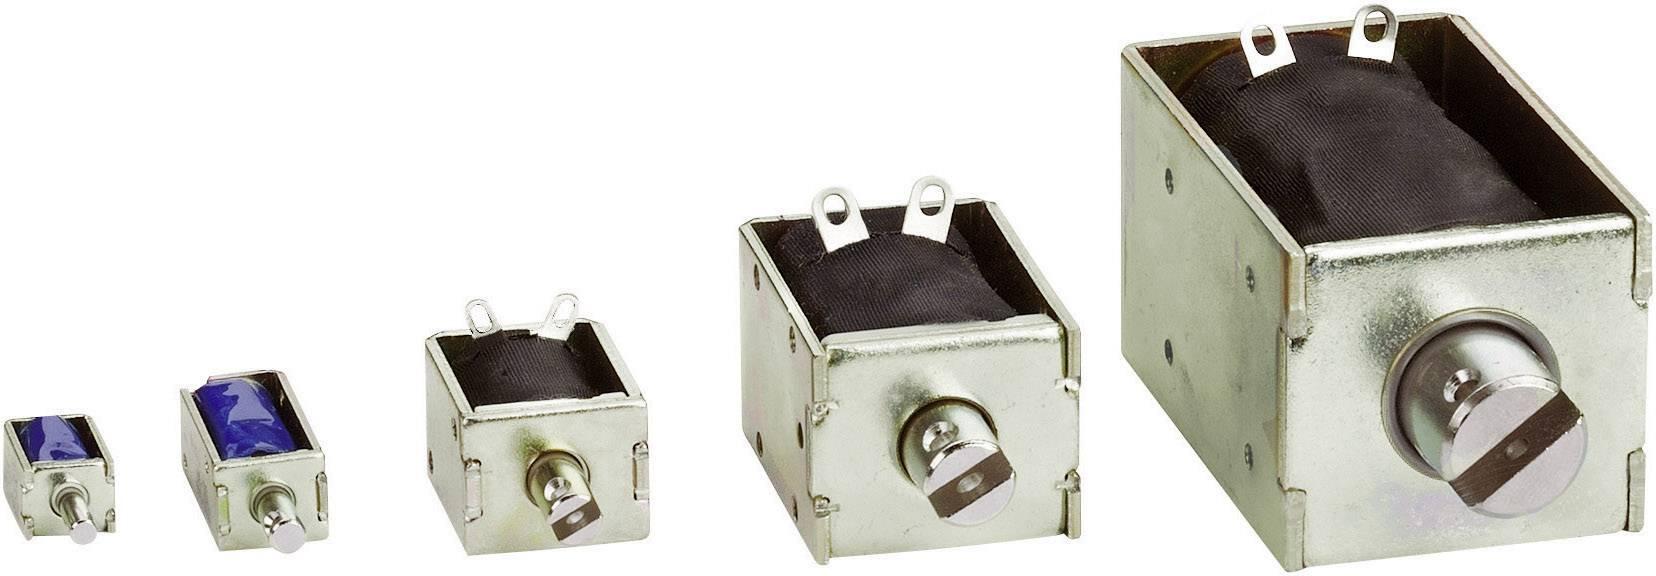 Zdvihací magnet zdvíhacie EBE Group TDS-03A 3100001, 0.04 N, 1.3 N, 12 V/DC, 0.8 W